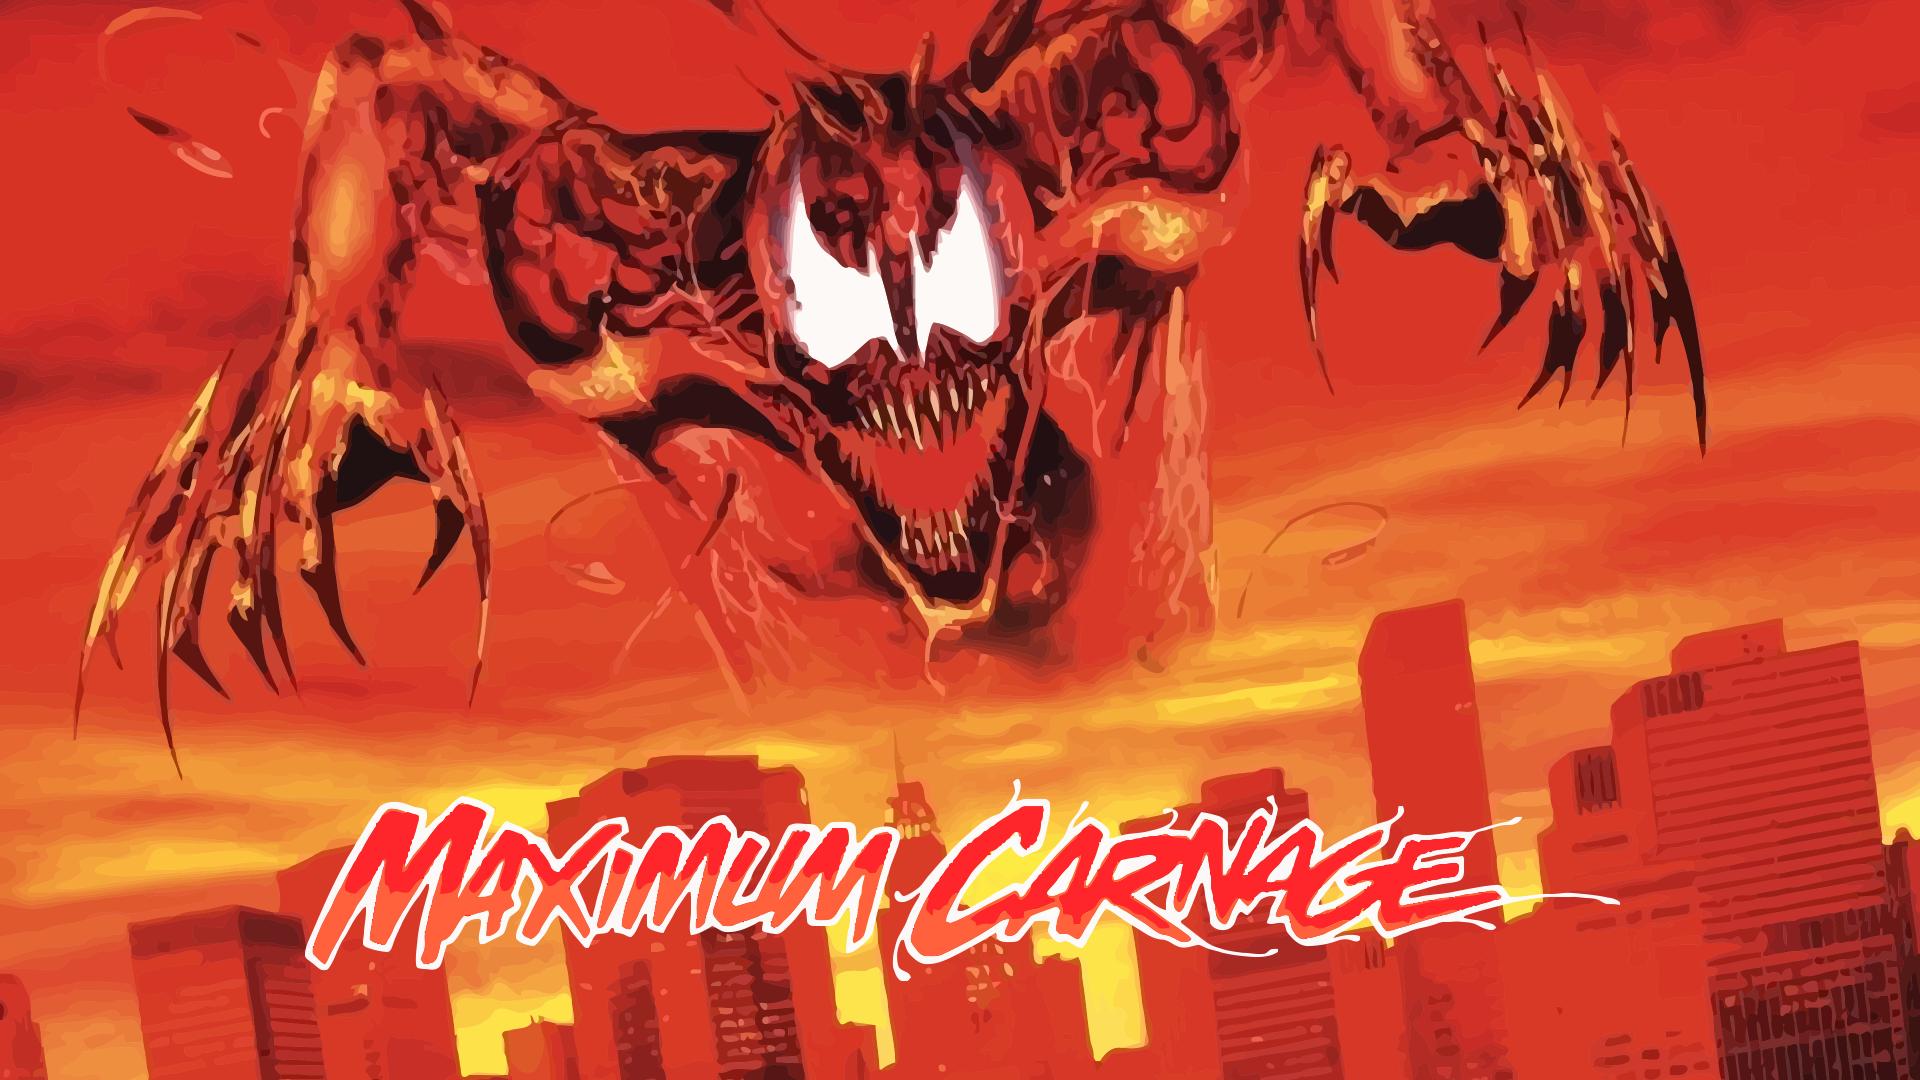 maximum carnage wallpaper - photo #8